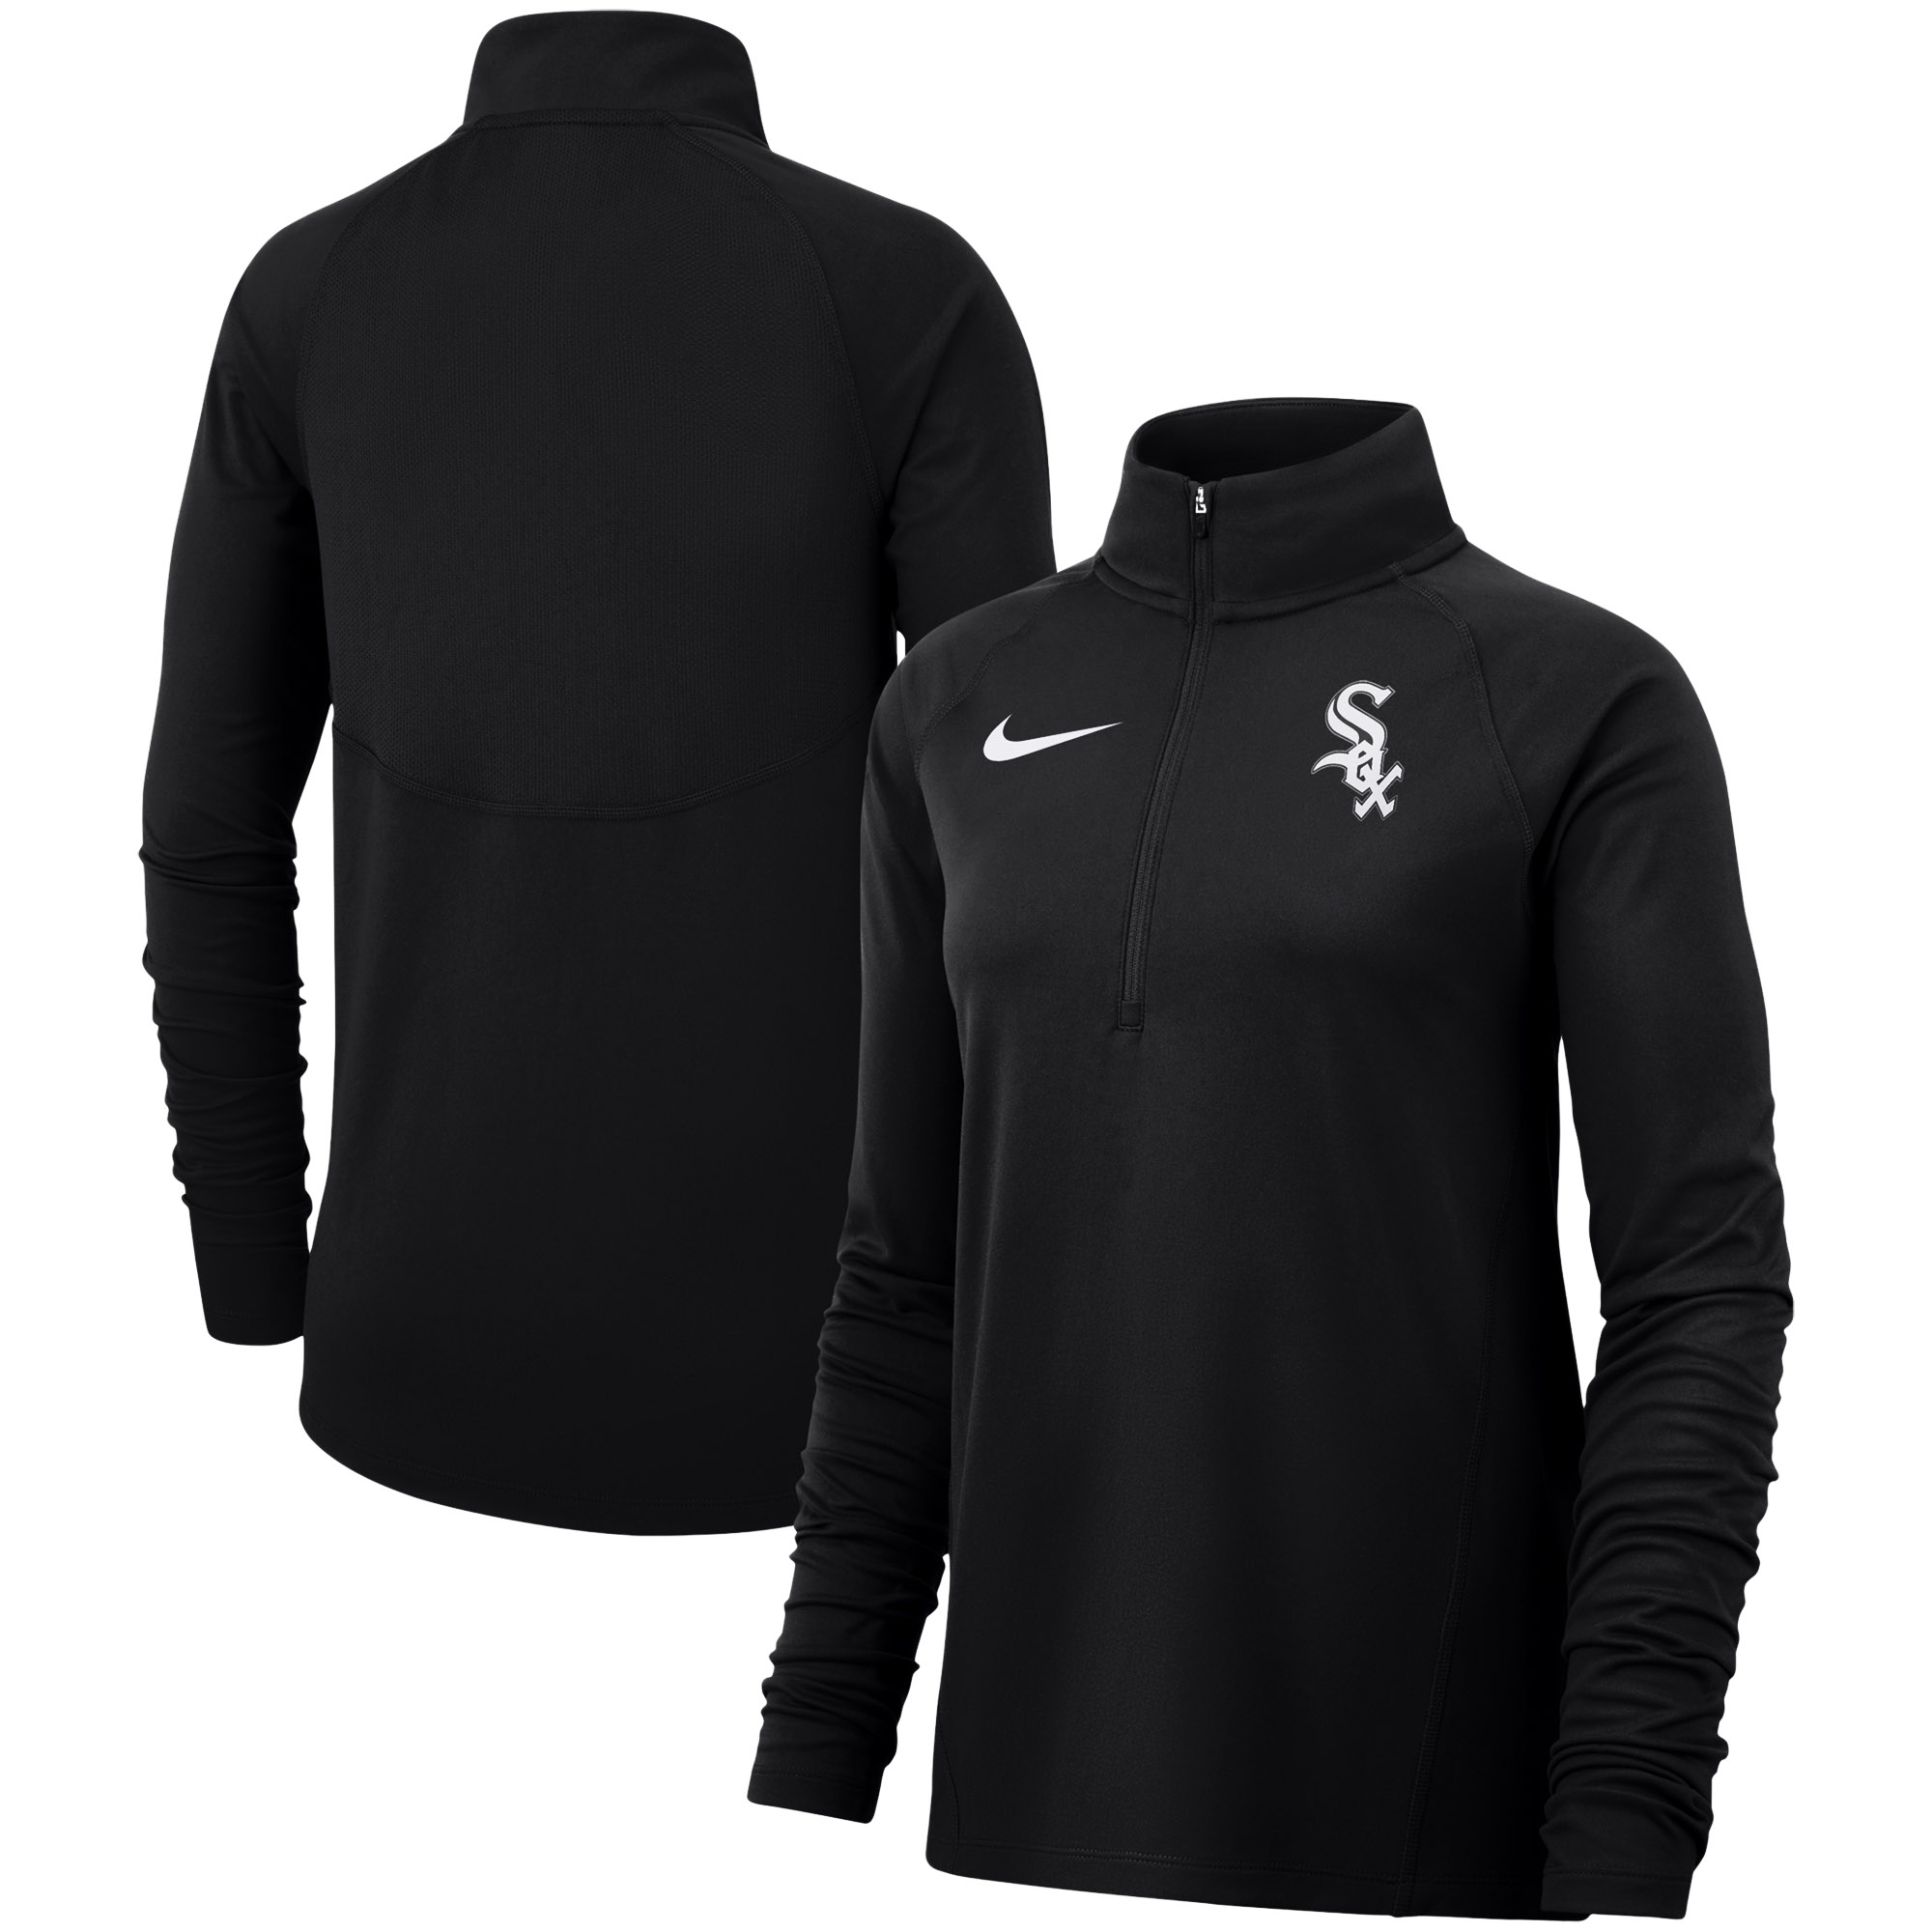 Chicago White Sox Nike Women's Team Core Half-Zip Raglan Pullover Jacket - Black